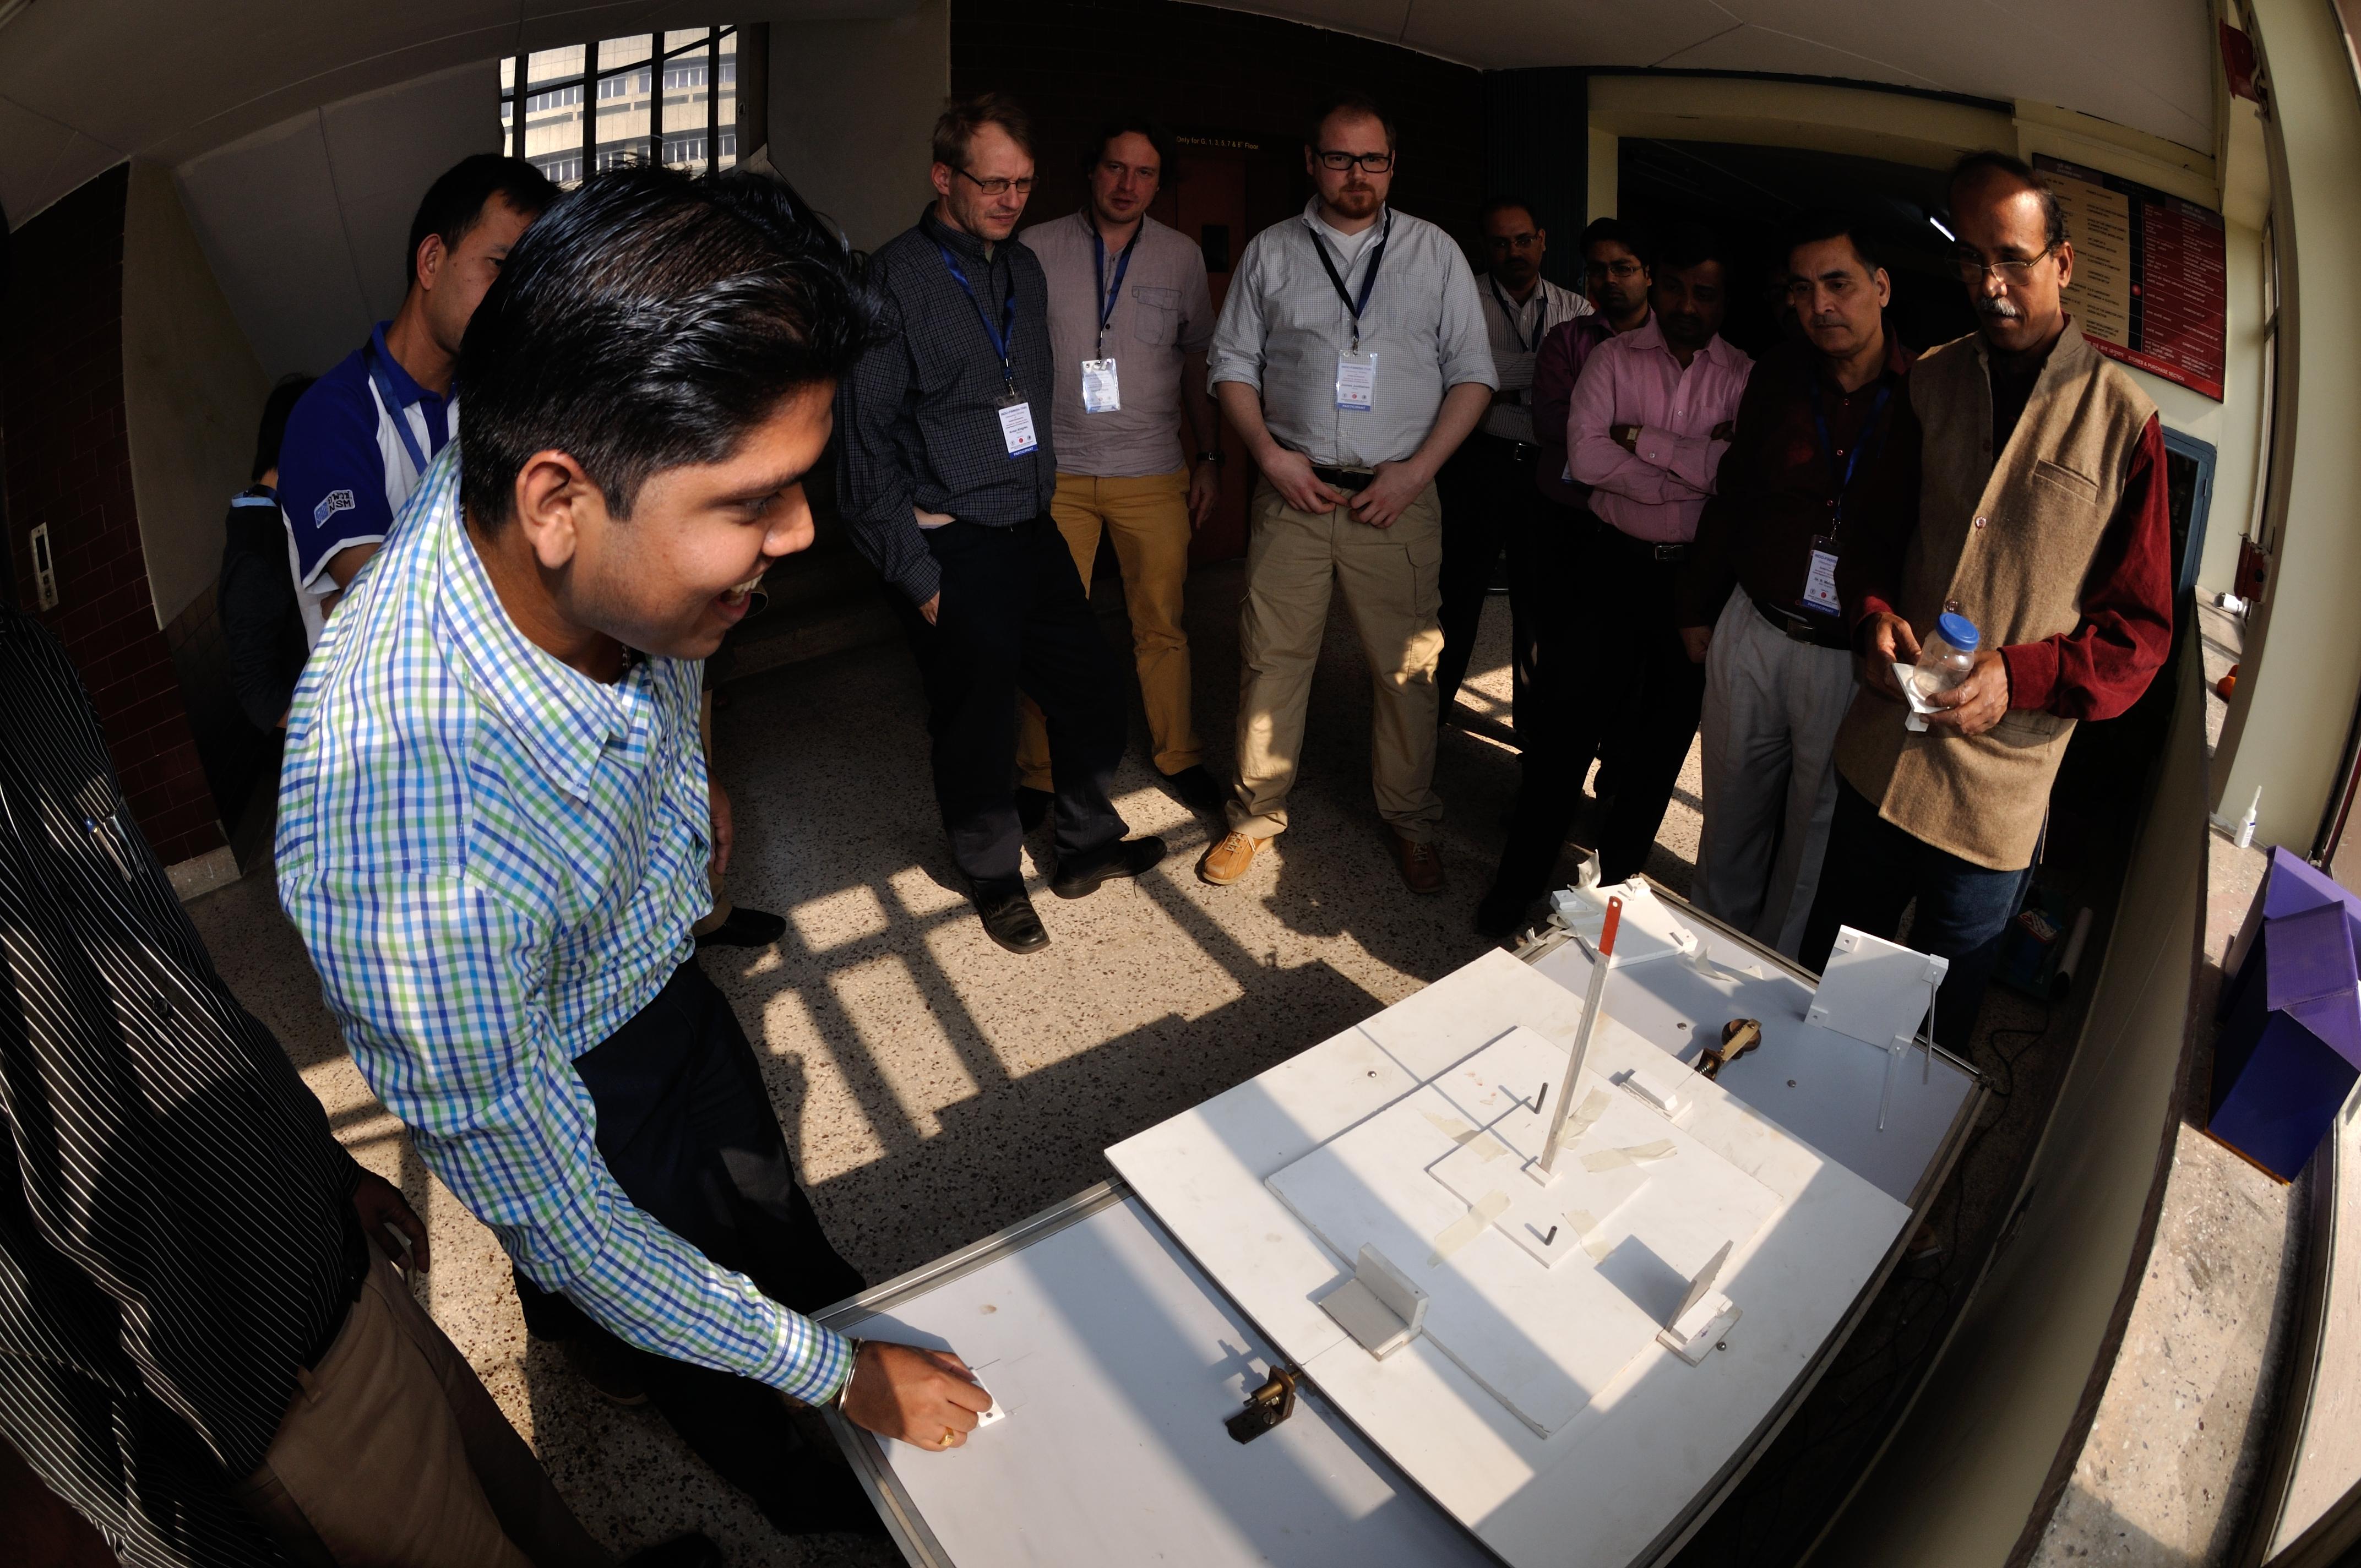 Earthquake Shake Table Wards Natural Science